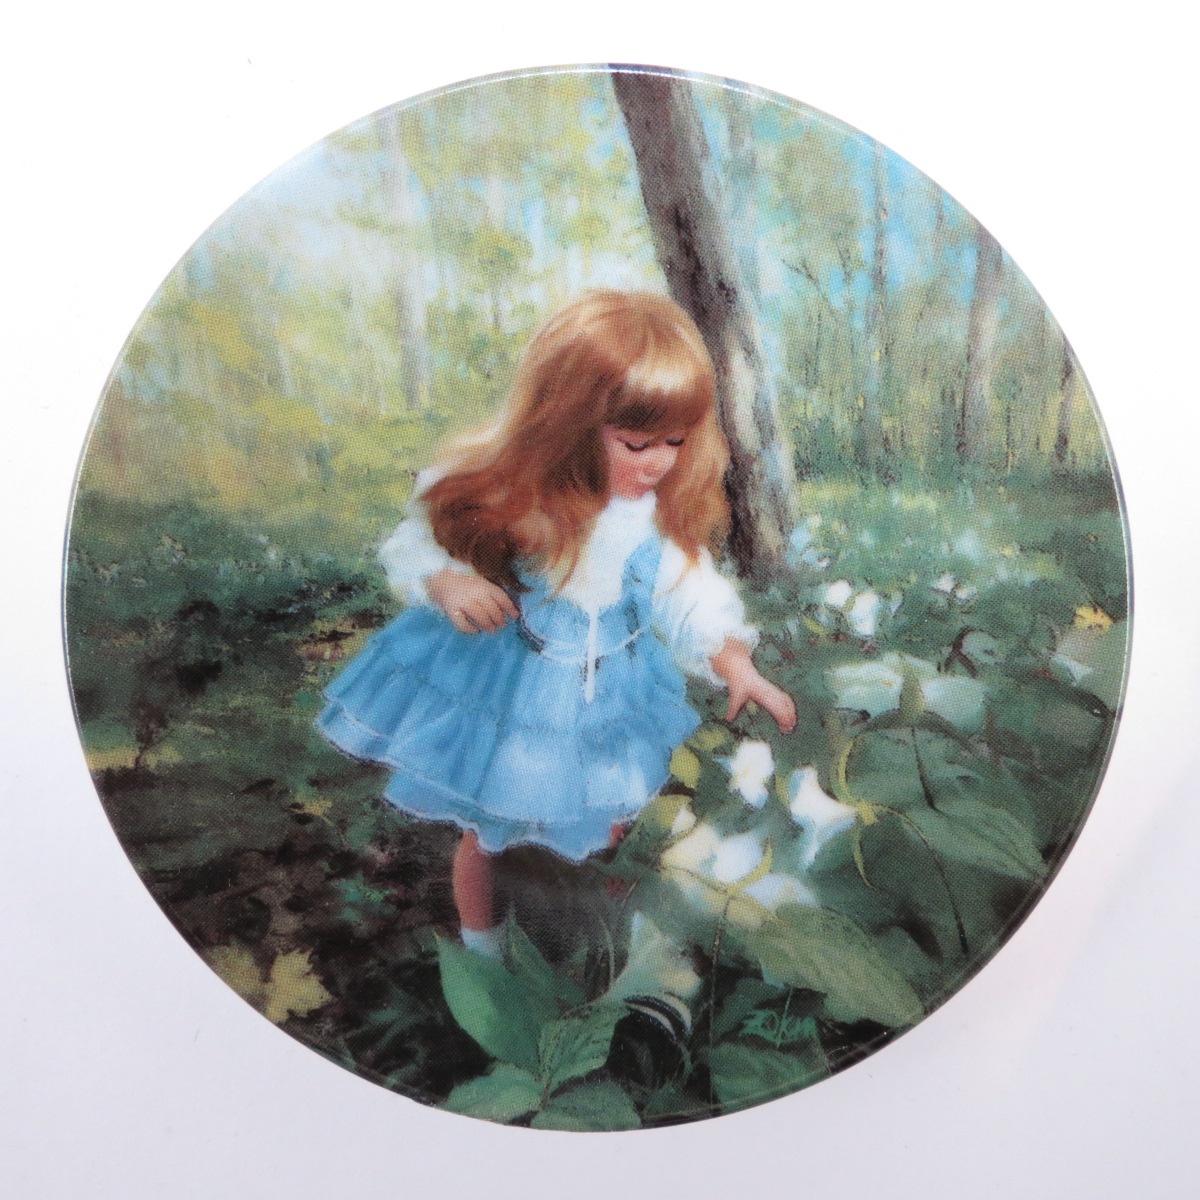 Декоративная тарелка Pemberton & Oakes Любимый детский художник Америки, 91461009